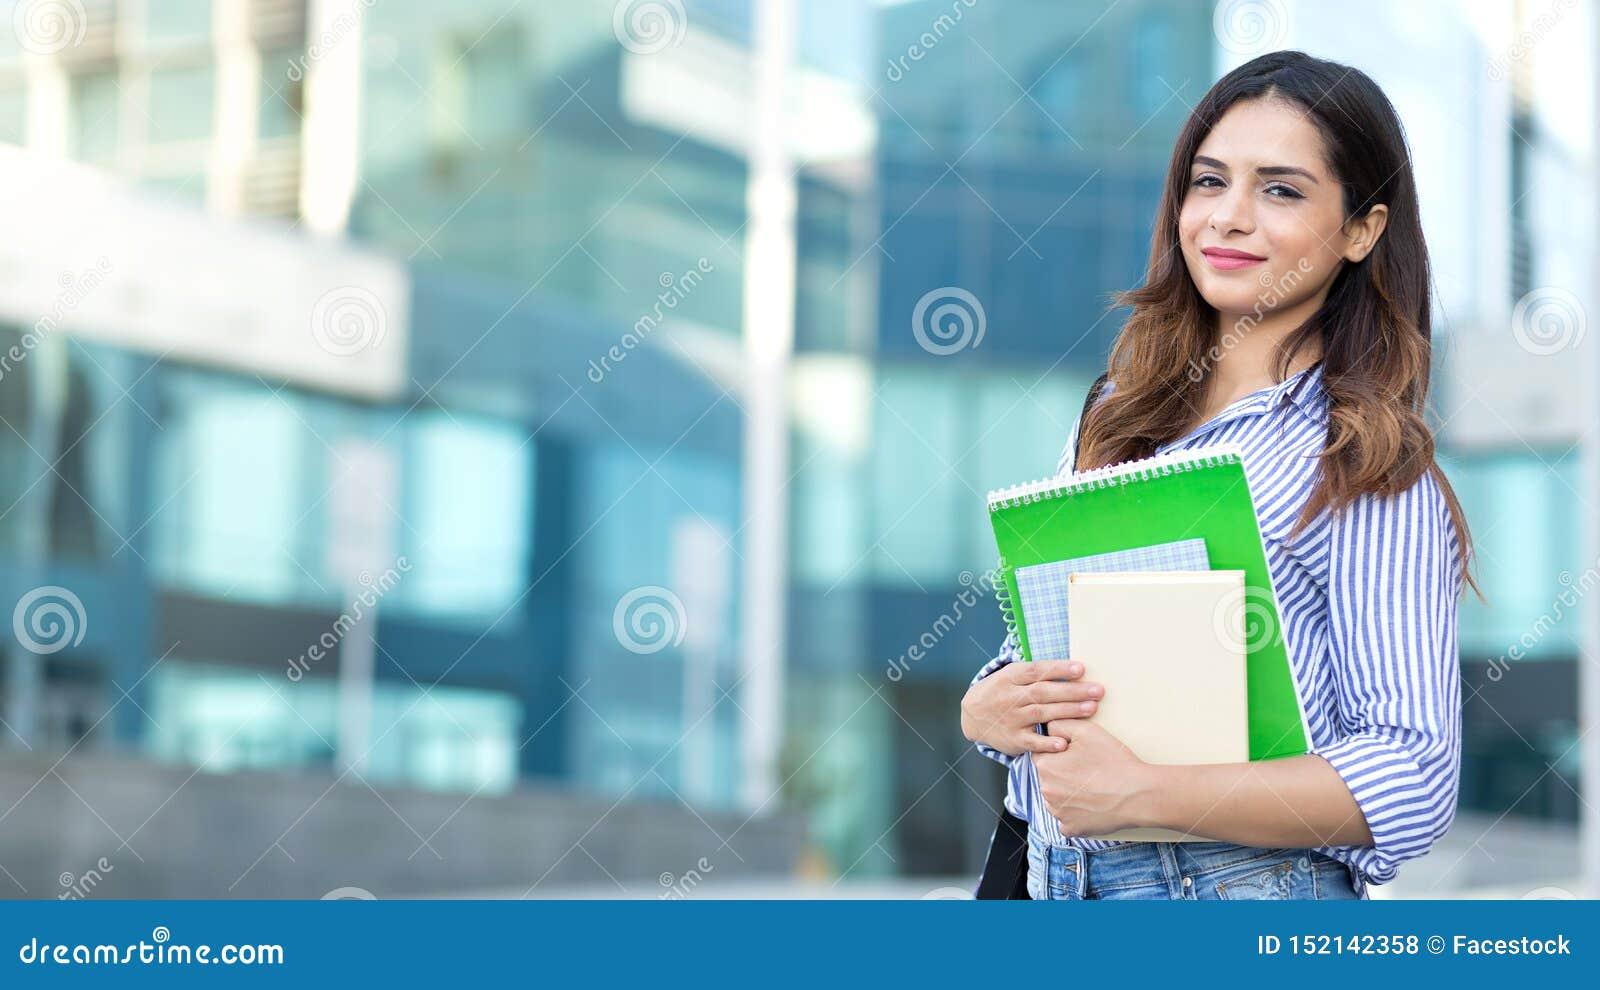 Ung le student som rymmer böcker, studie, utbildning, kunskap, målbegrepp